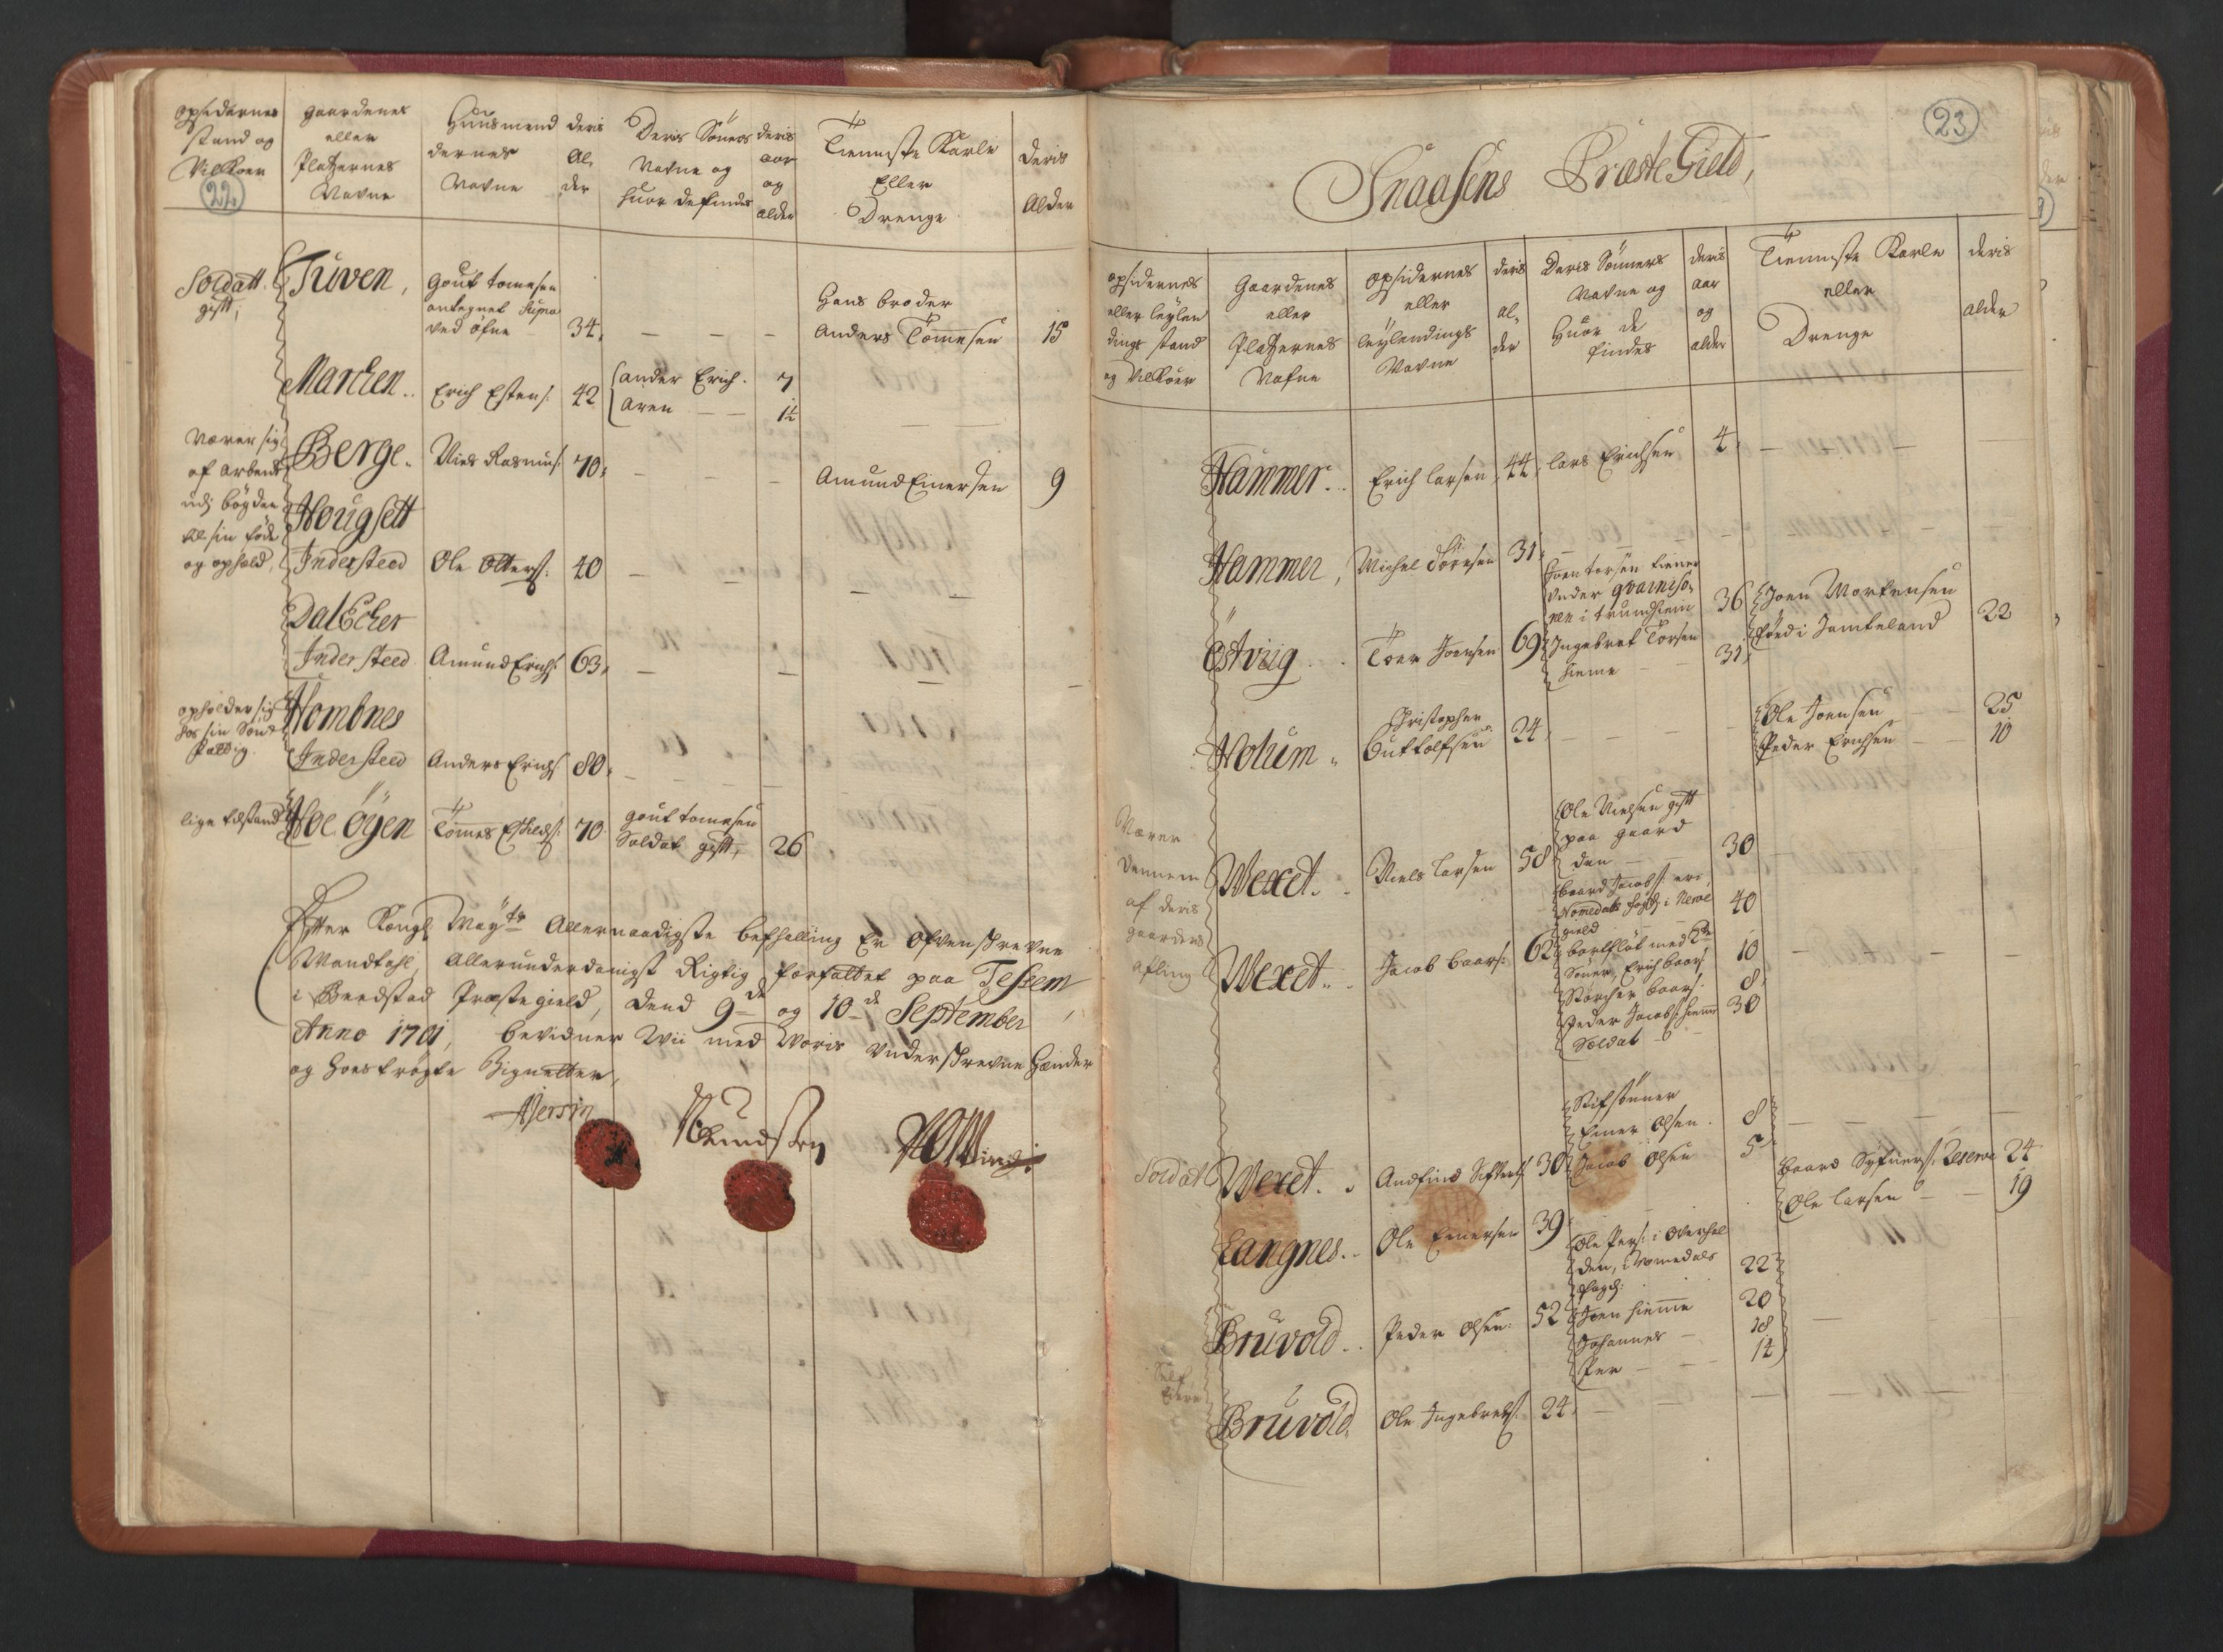 RA, Manntallet 1701, nr. 15: Inderøy fogderi og Namdal fogderi, 1701, s. 22-23